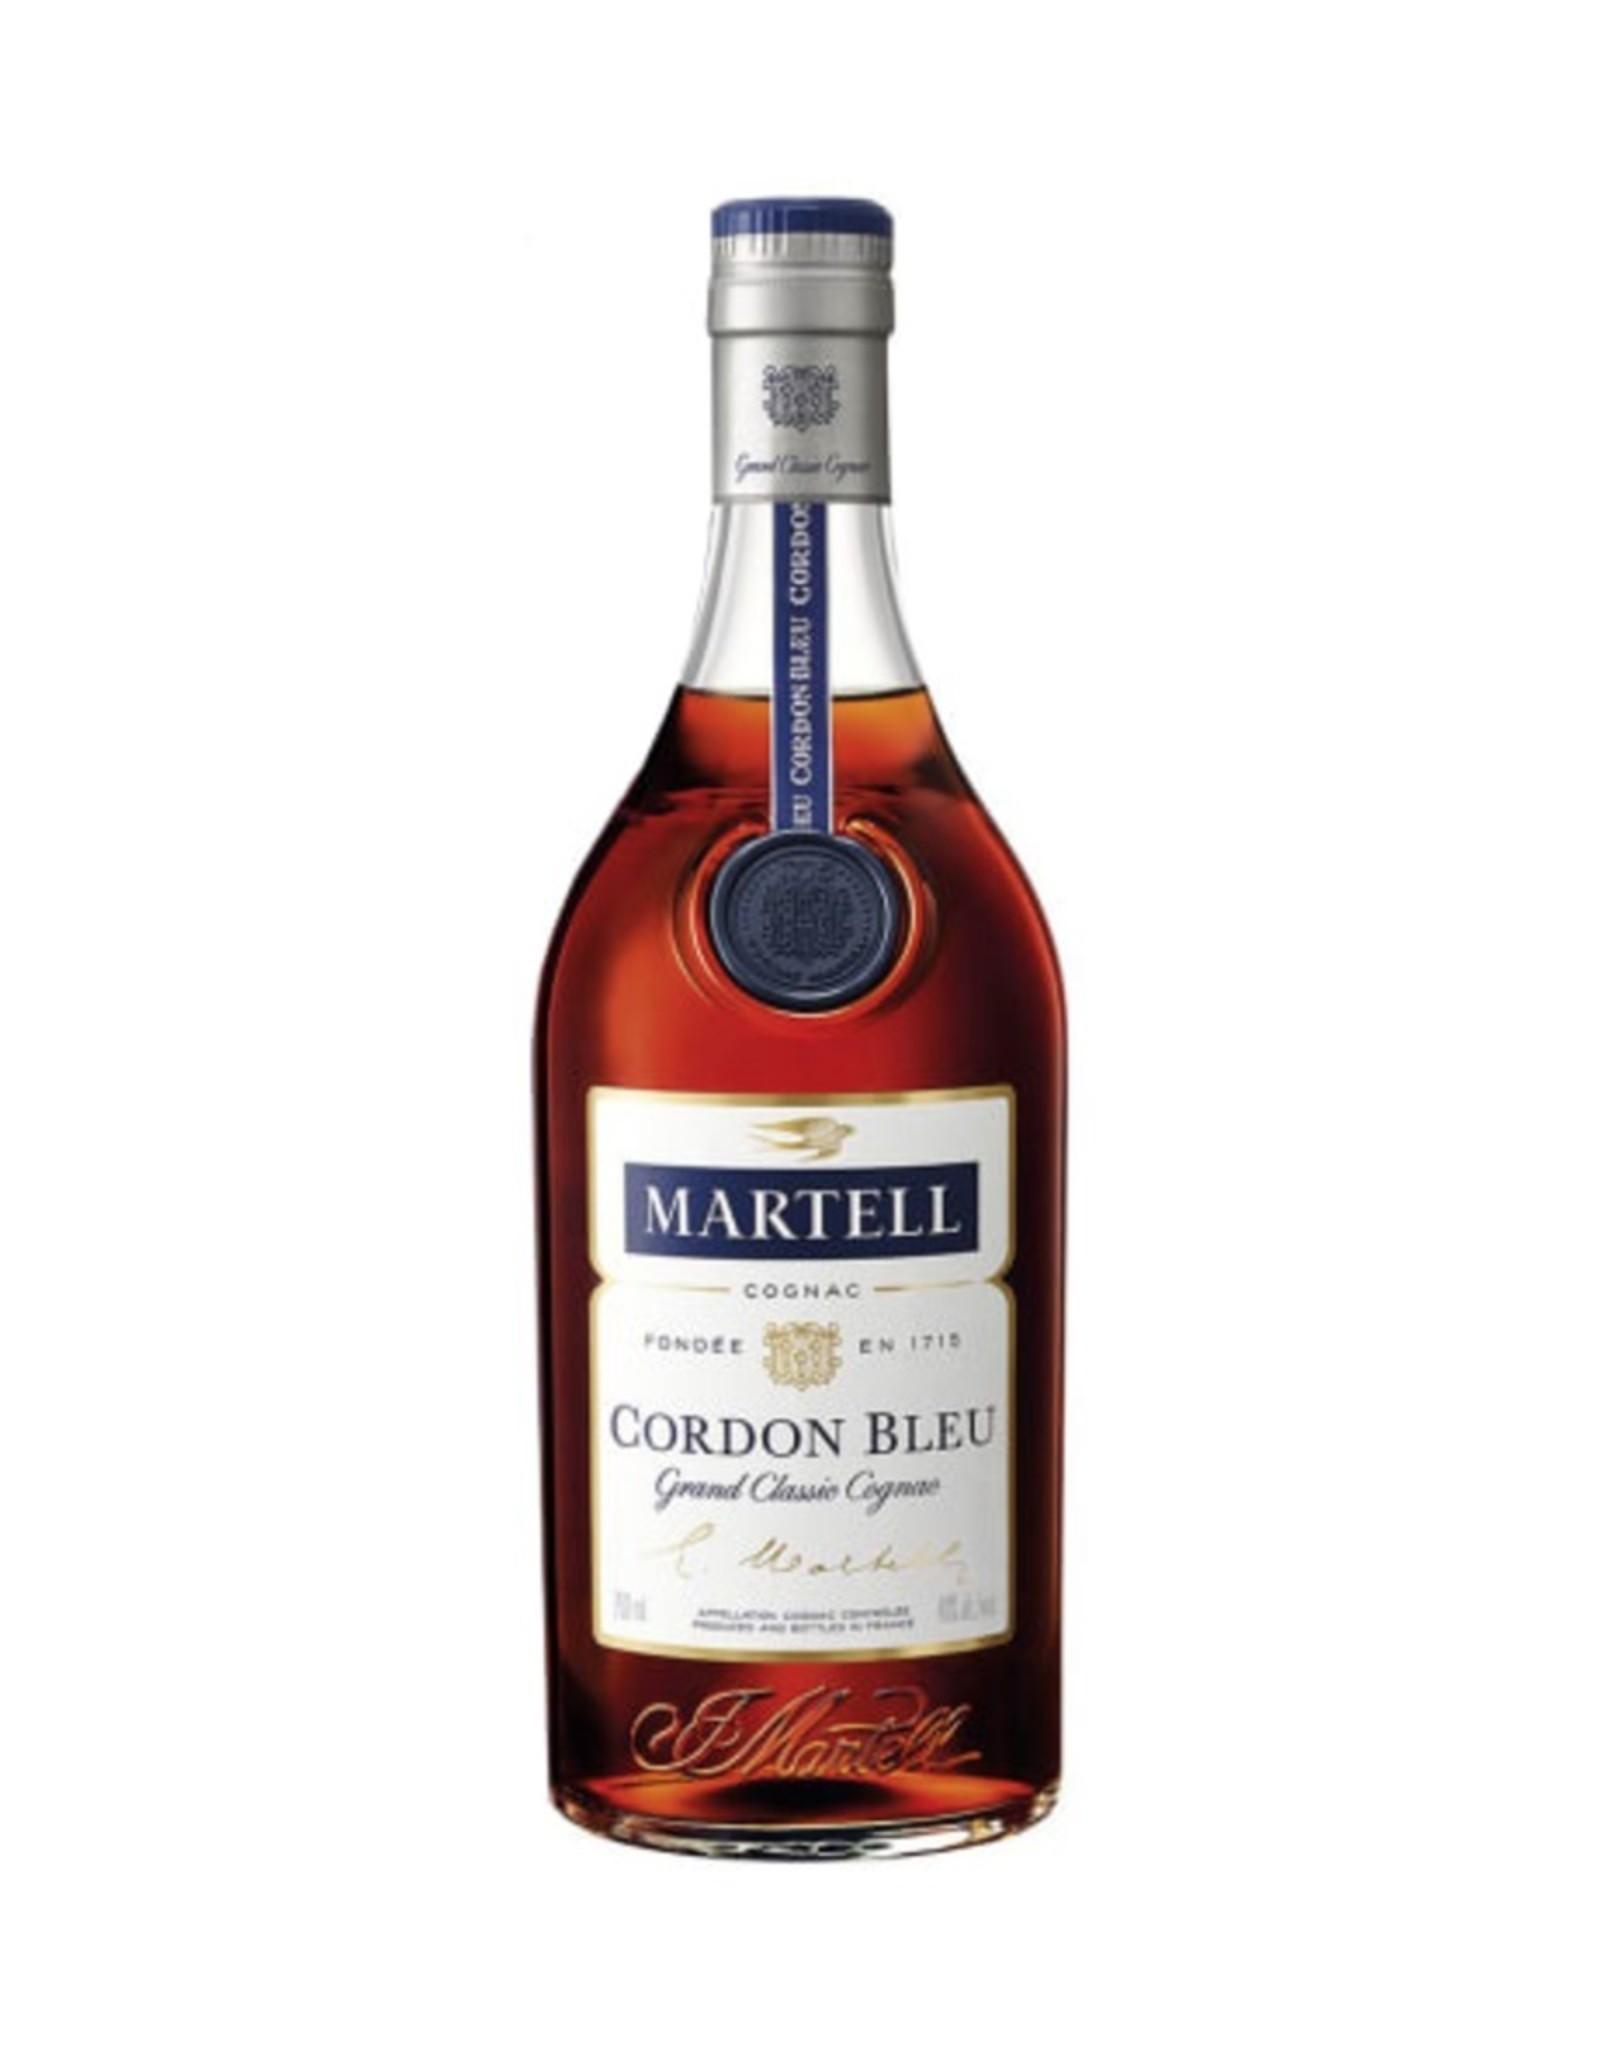 Martell Cordon Bleu Extra Cognac, France 1L